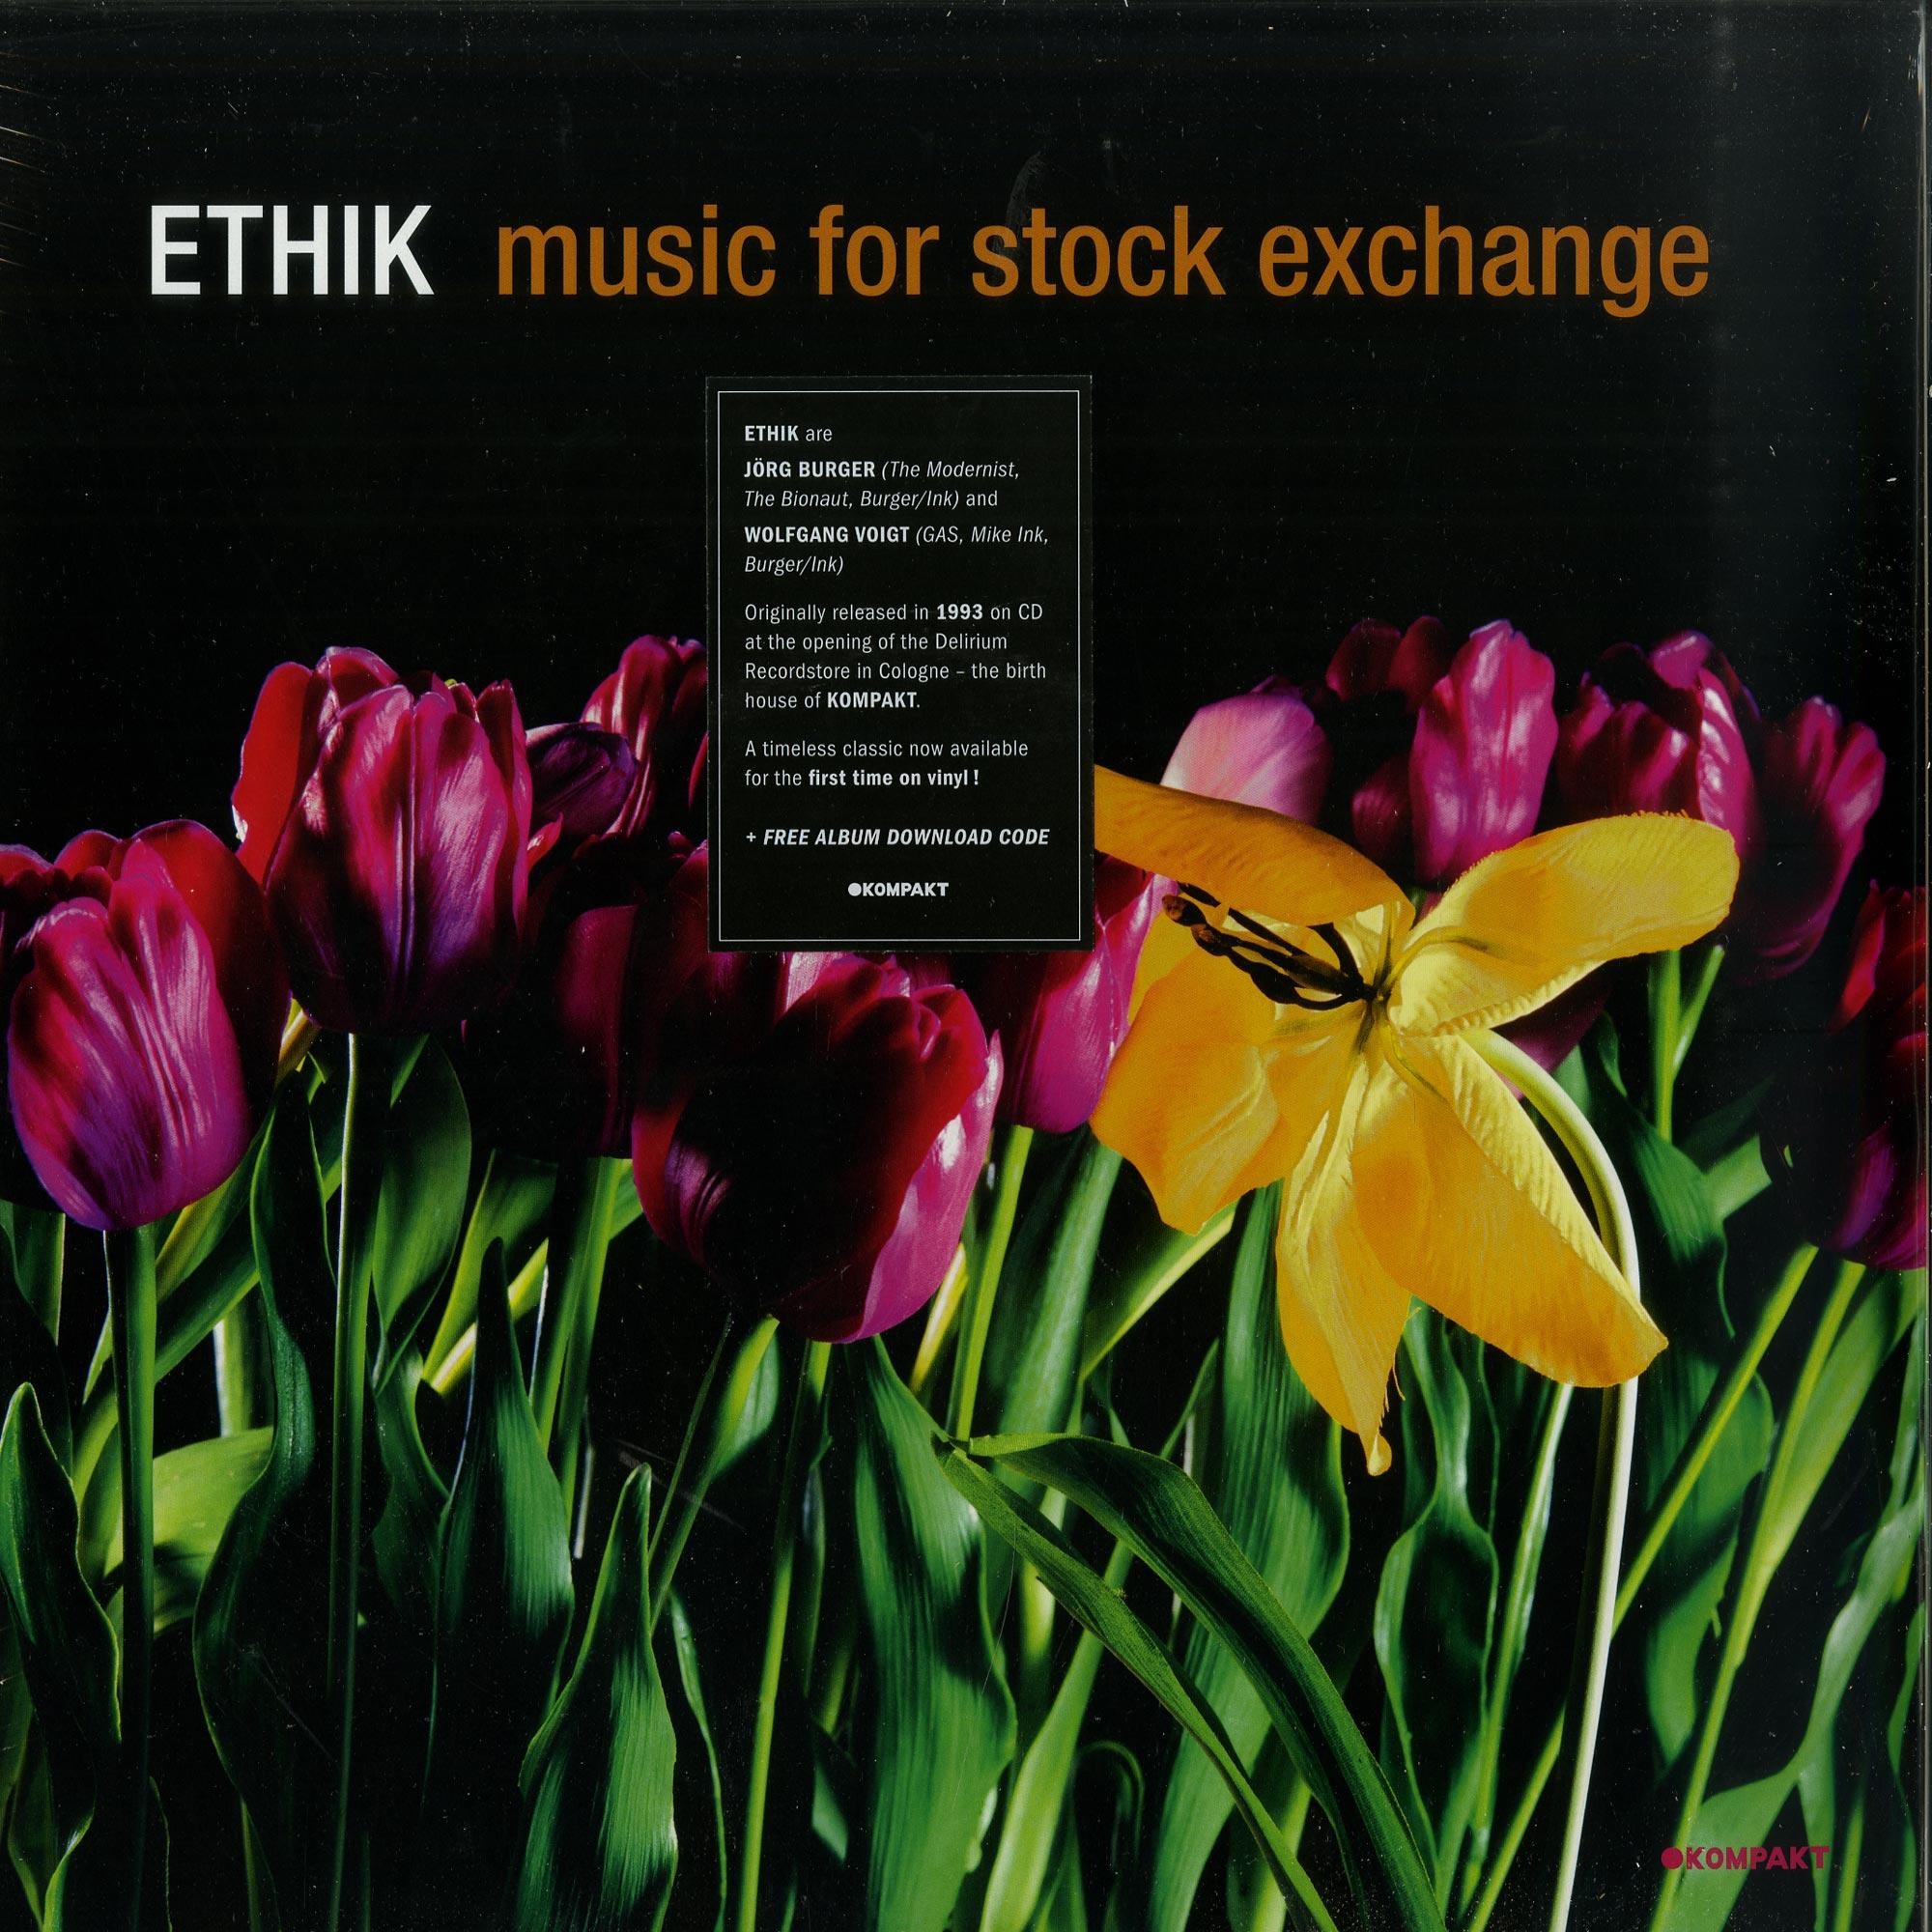 Ethik - MUSIC FOR STOCK EXCHANGE